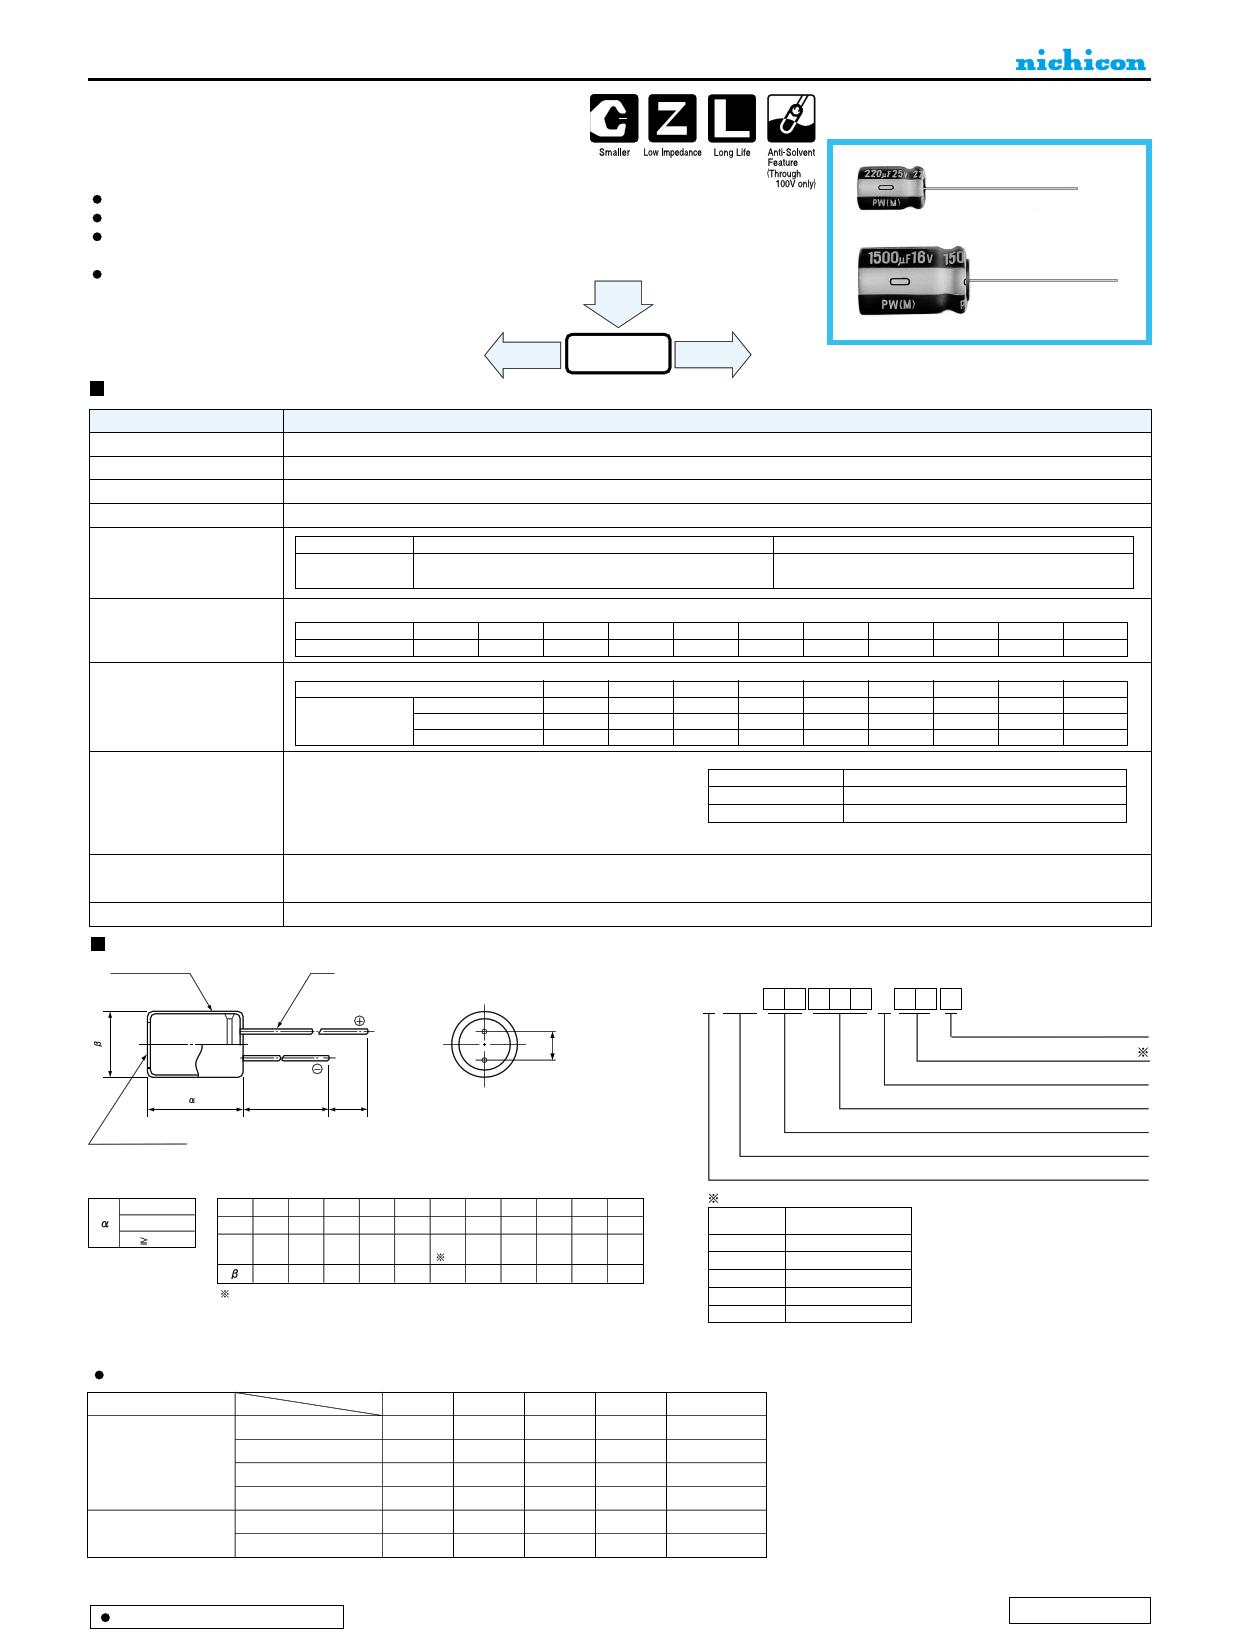 UPW1H121MPD6 데이터시트 및 UPW1H121MPD6 PDF